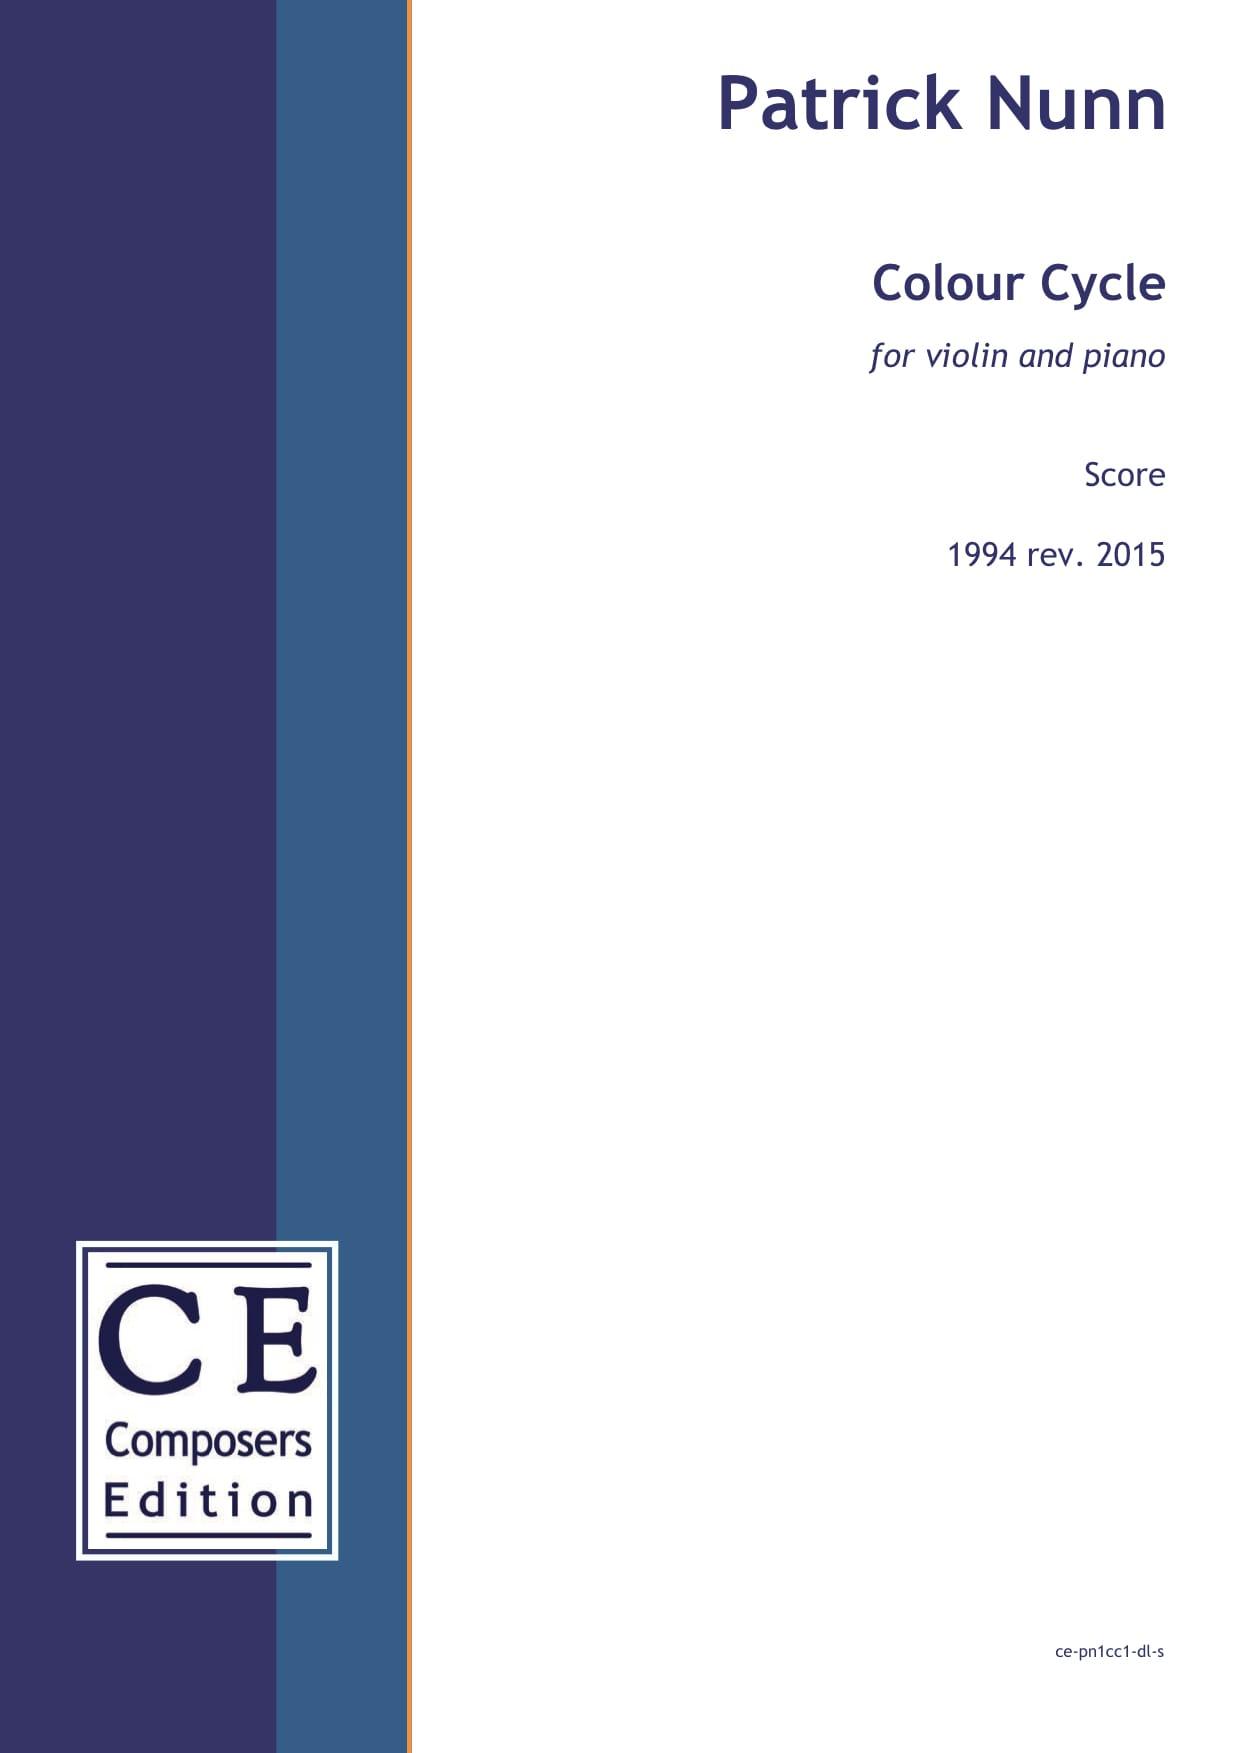 Patrick Nunn: Colour Cycle for violin and piano